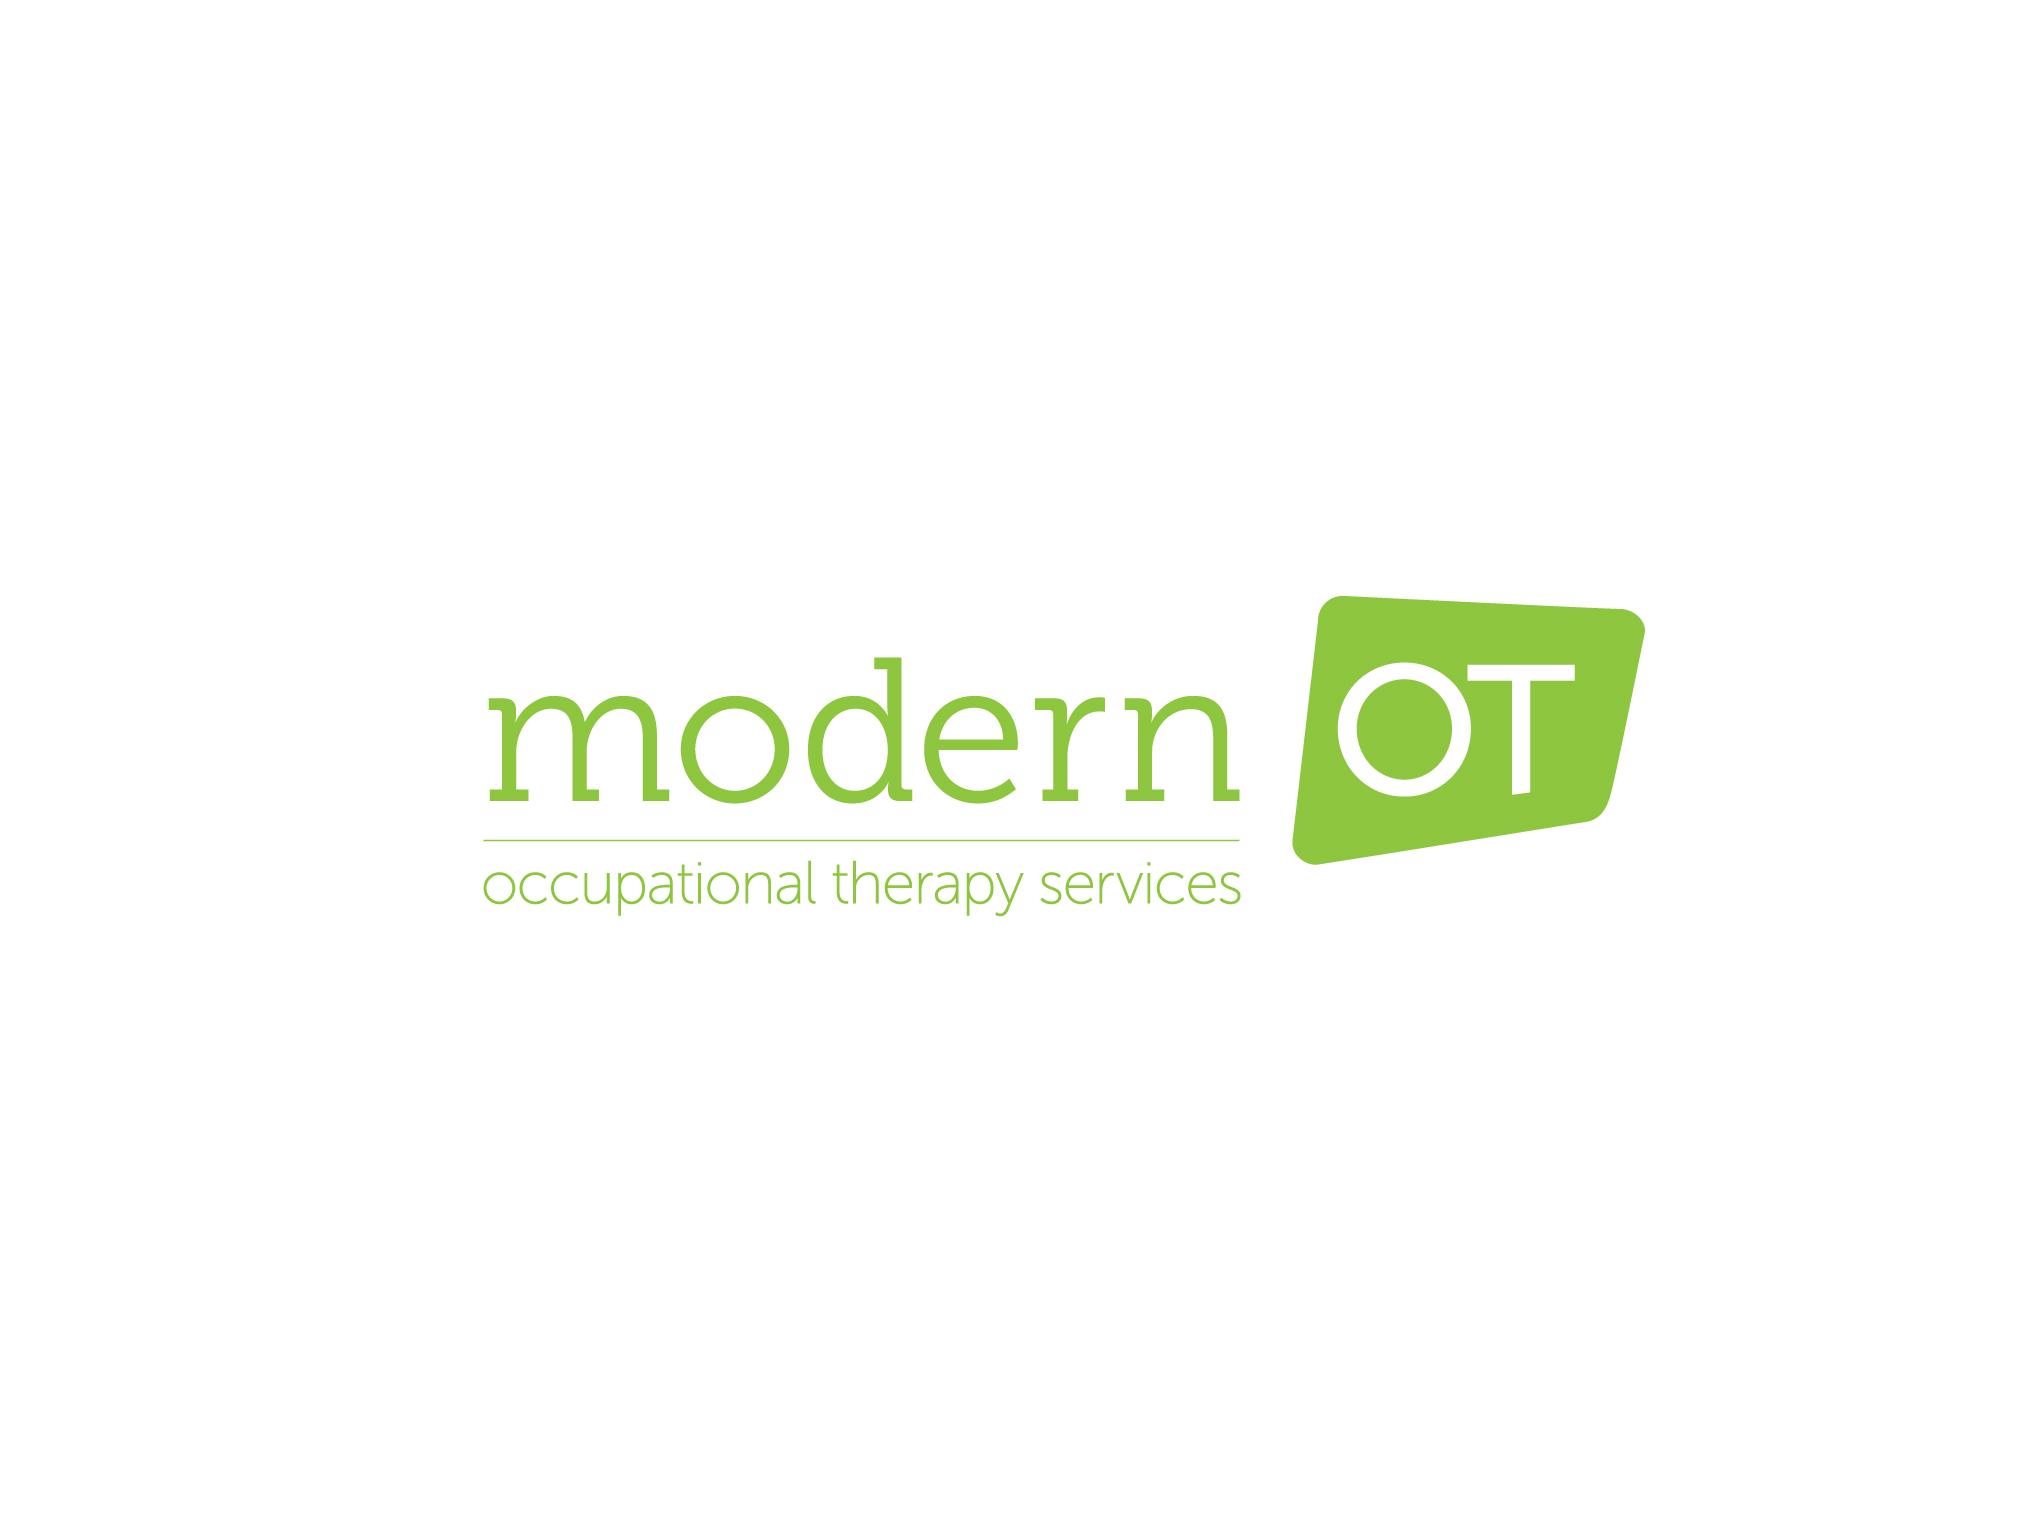 modernOT-logo-Jun2015-300dpi.jpg